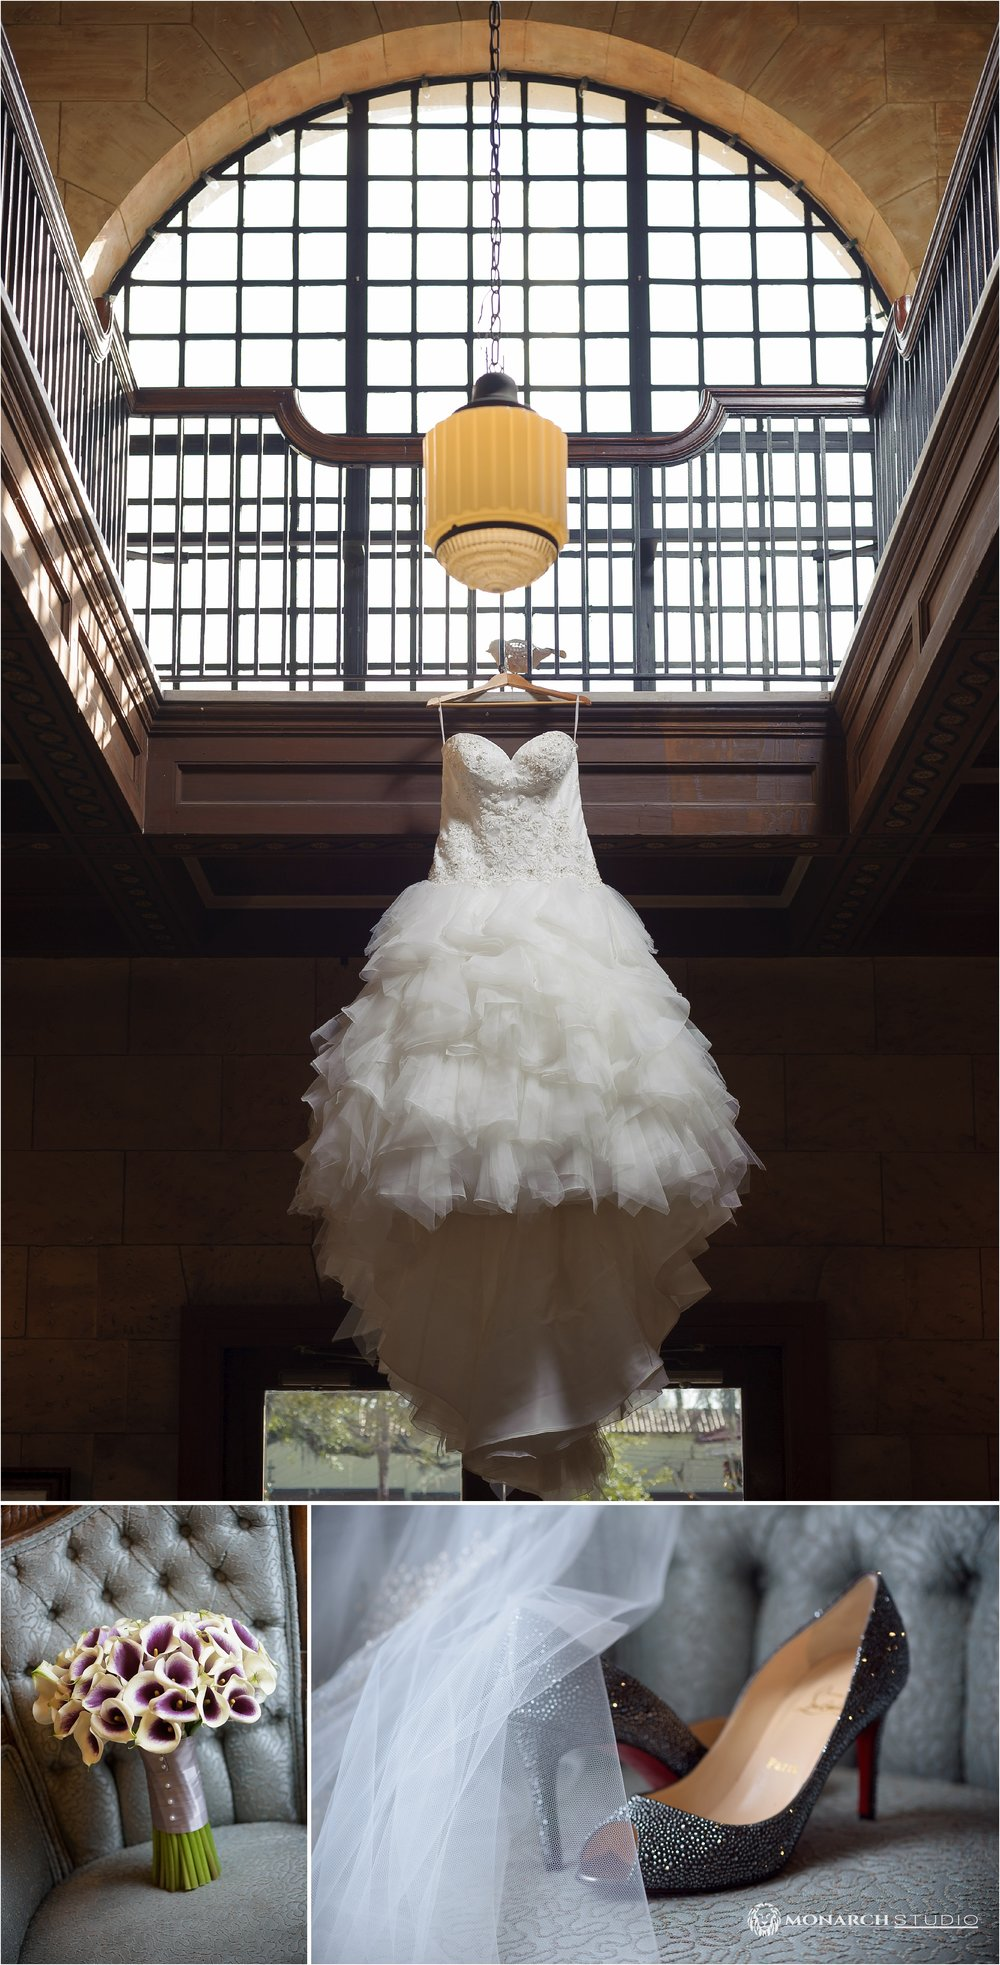 st-augustine-wedding-photographer-treasury-on-the-plaza-002.jpg